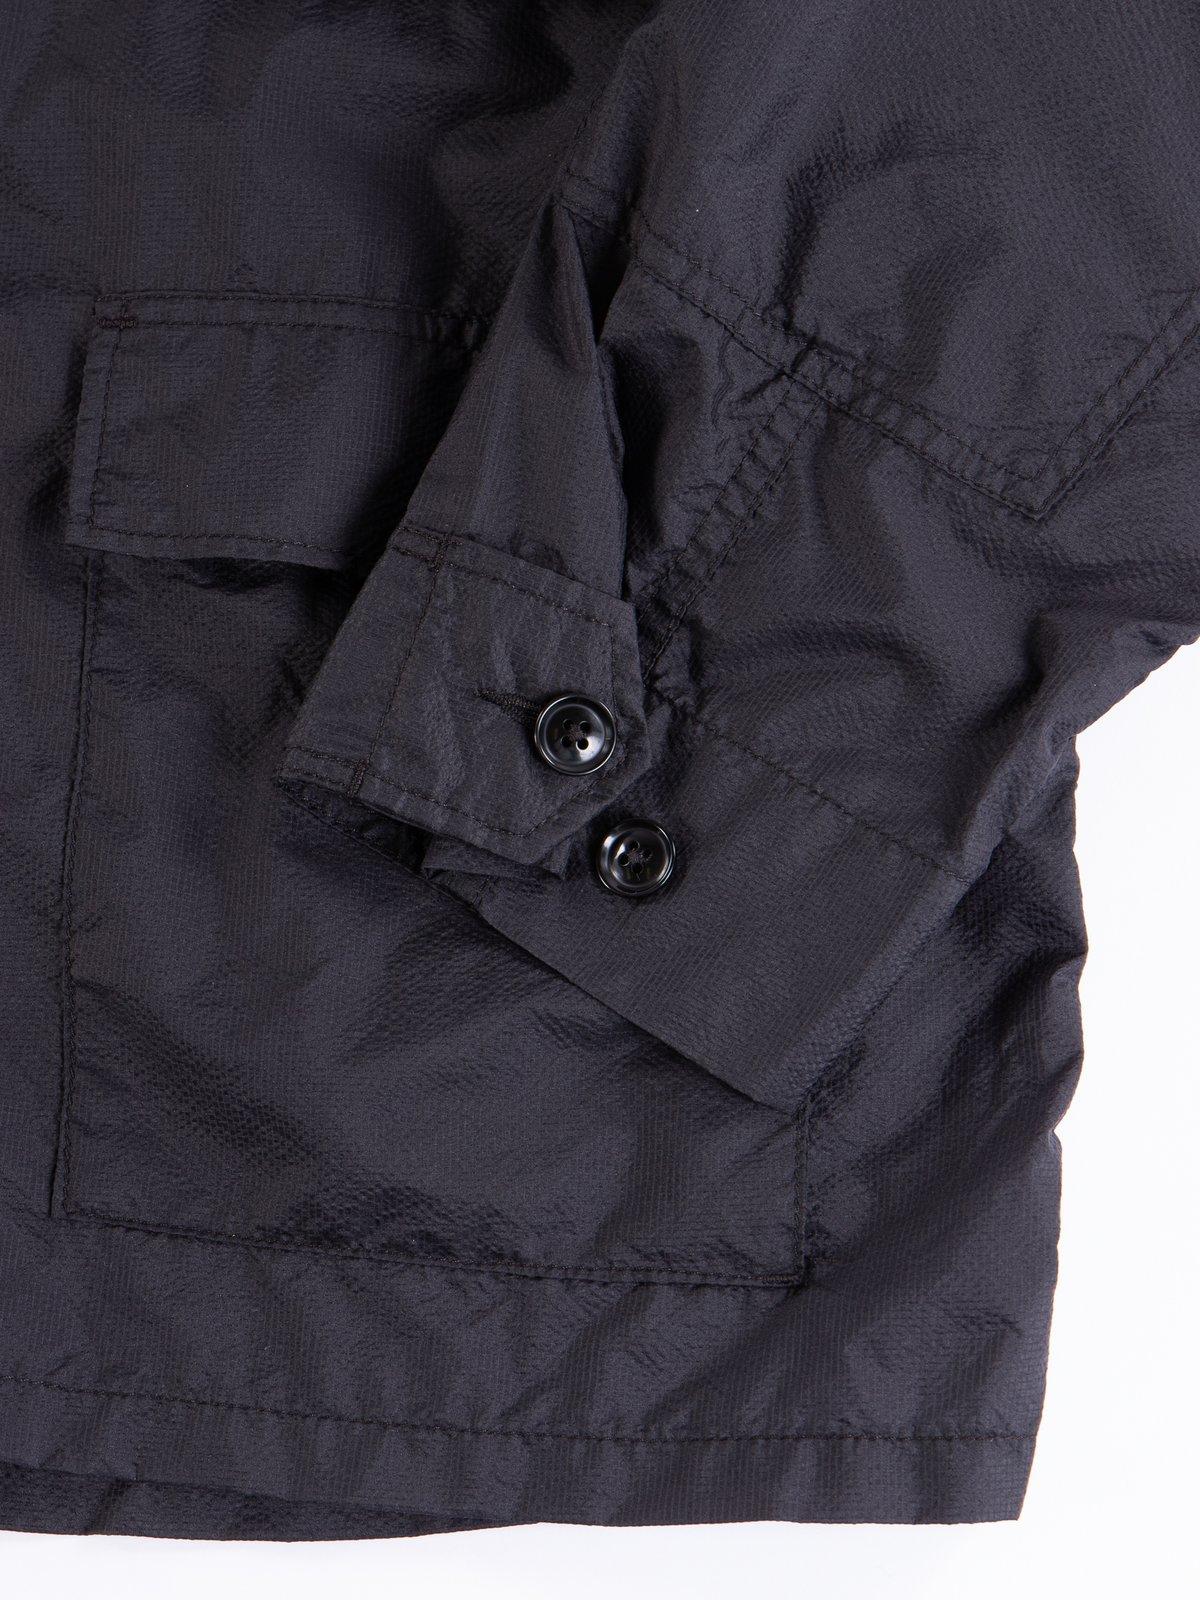 Black Nylon Micro Ripstop BDU Jacket - Image 4